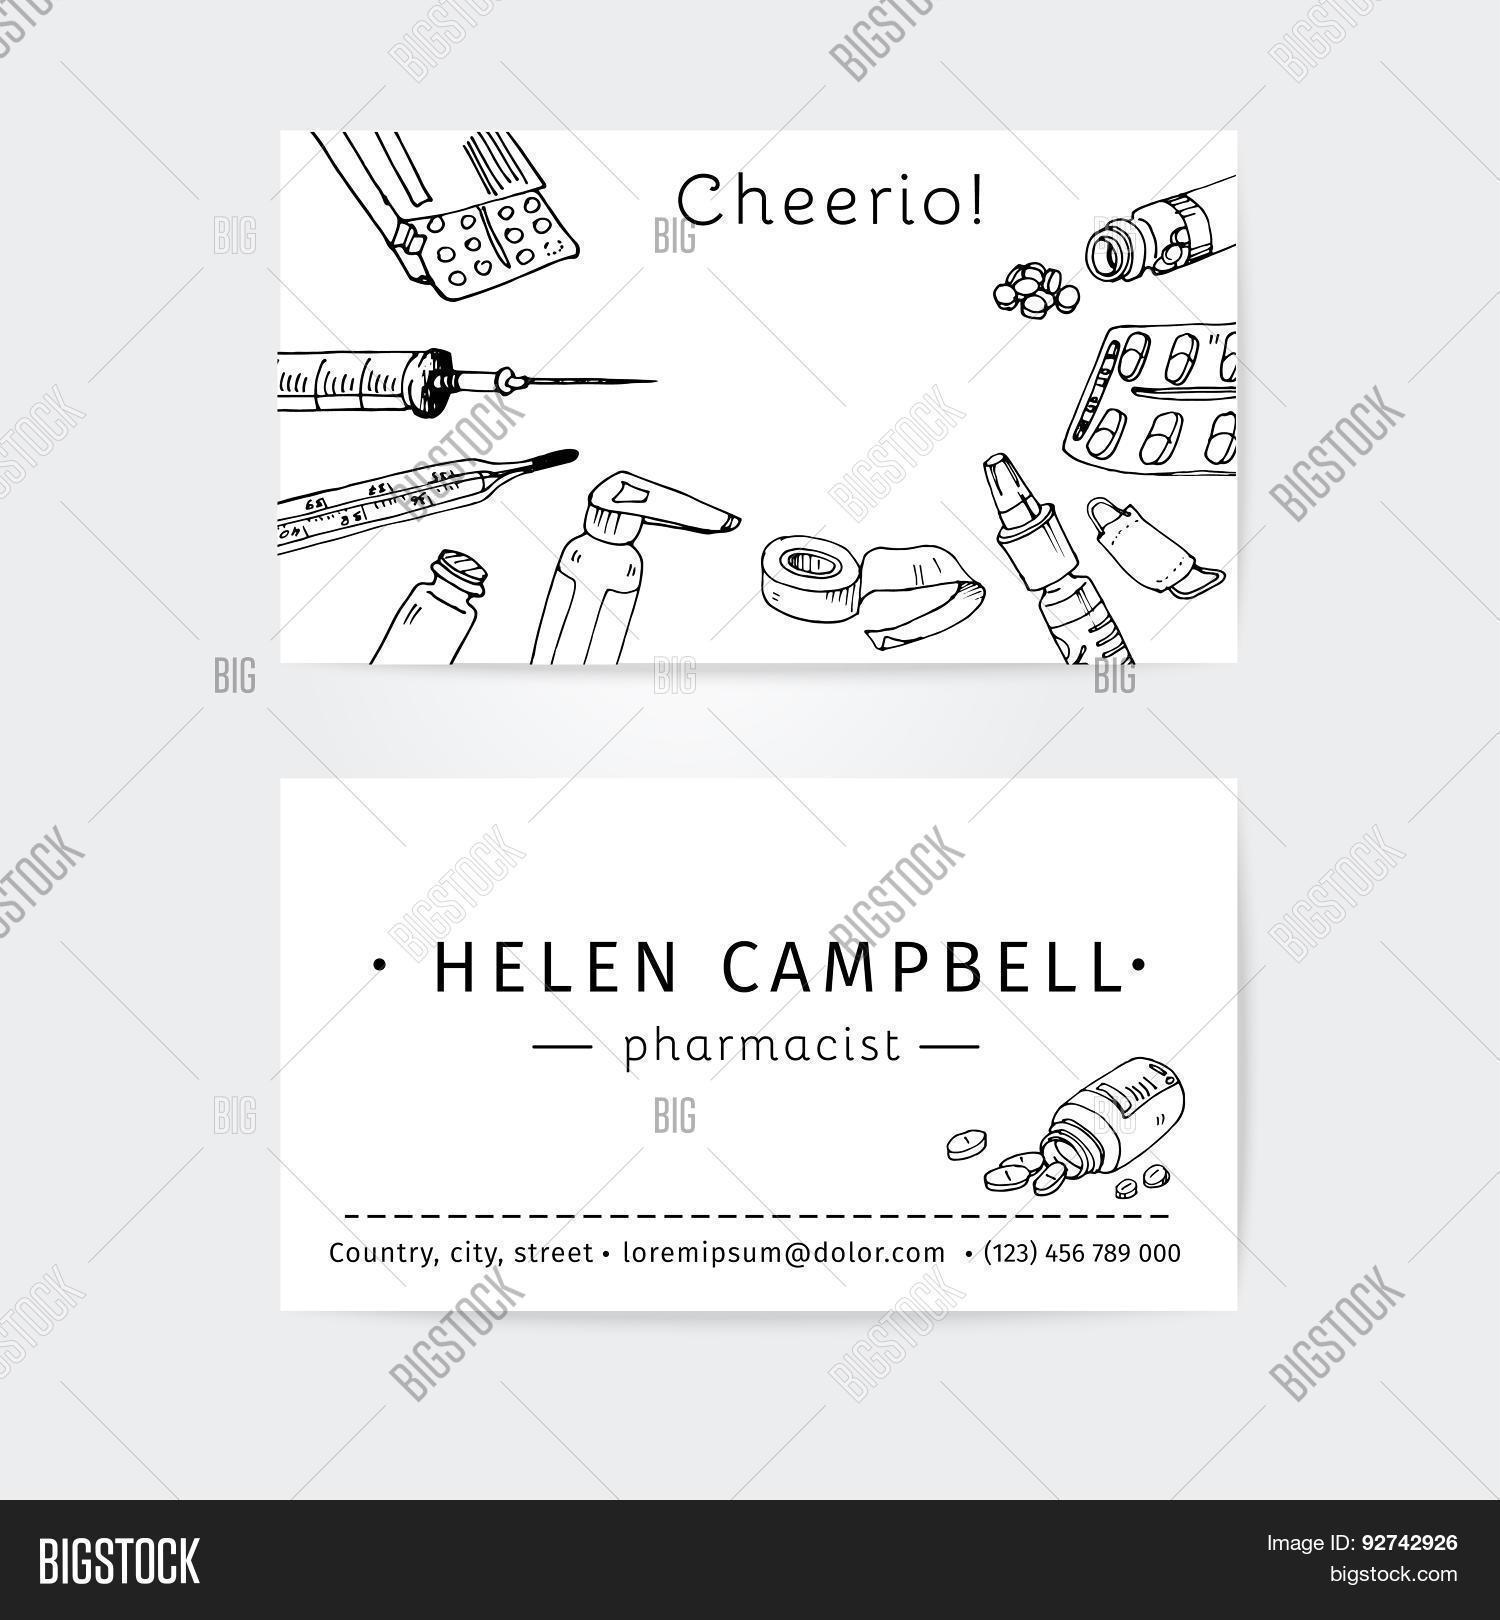 Business Cards Design Template Vector & Photo | Bigstock